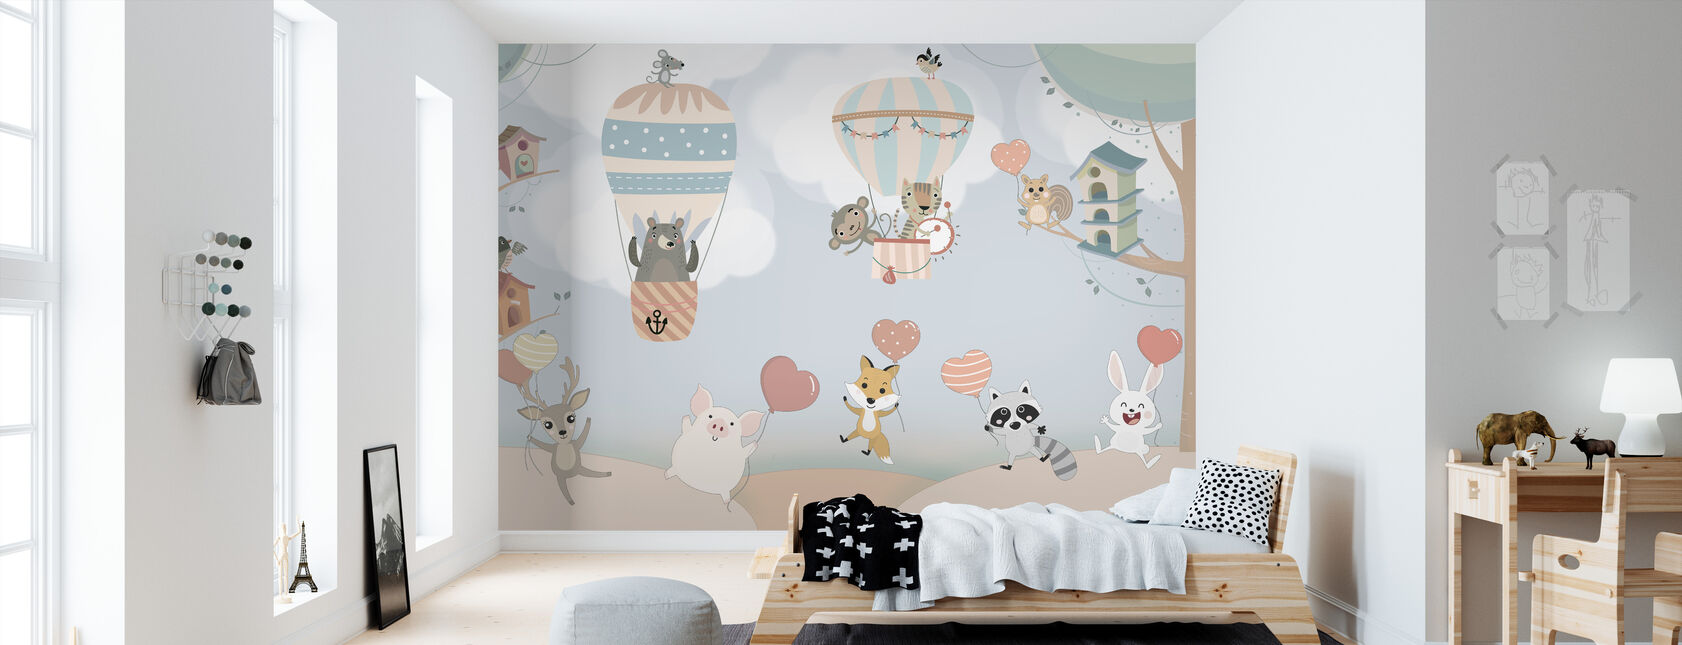 Happy Animal Buddies - Wallpaper - Kids Room